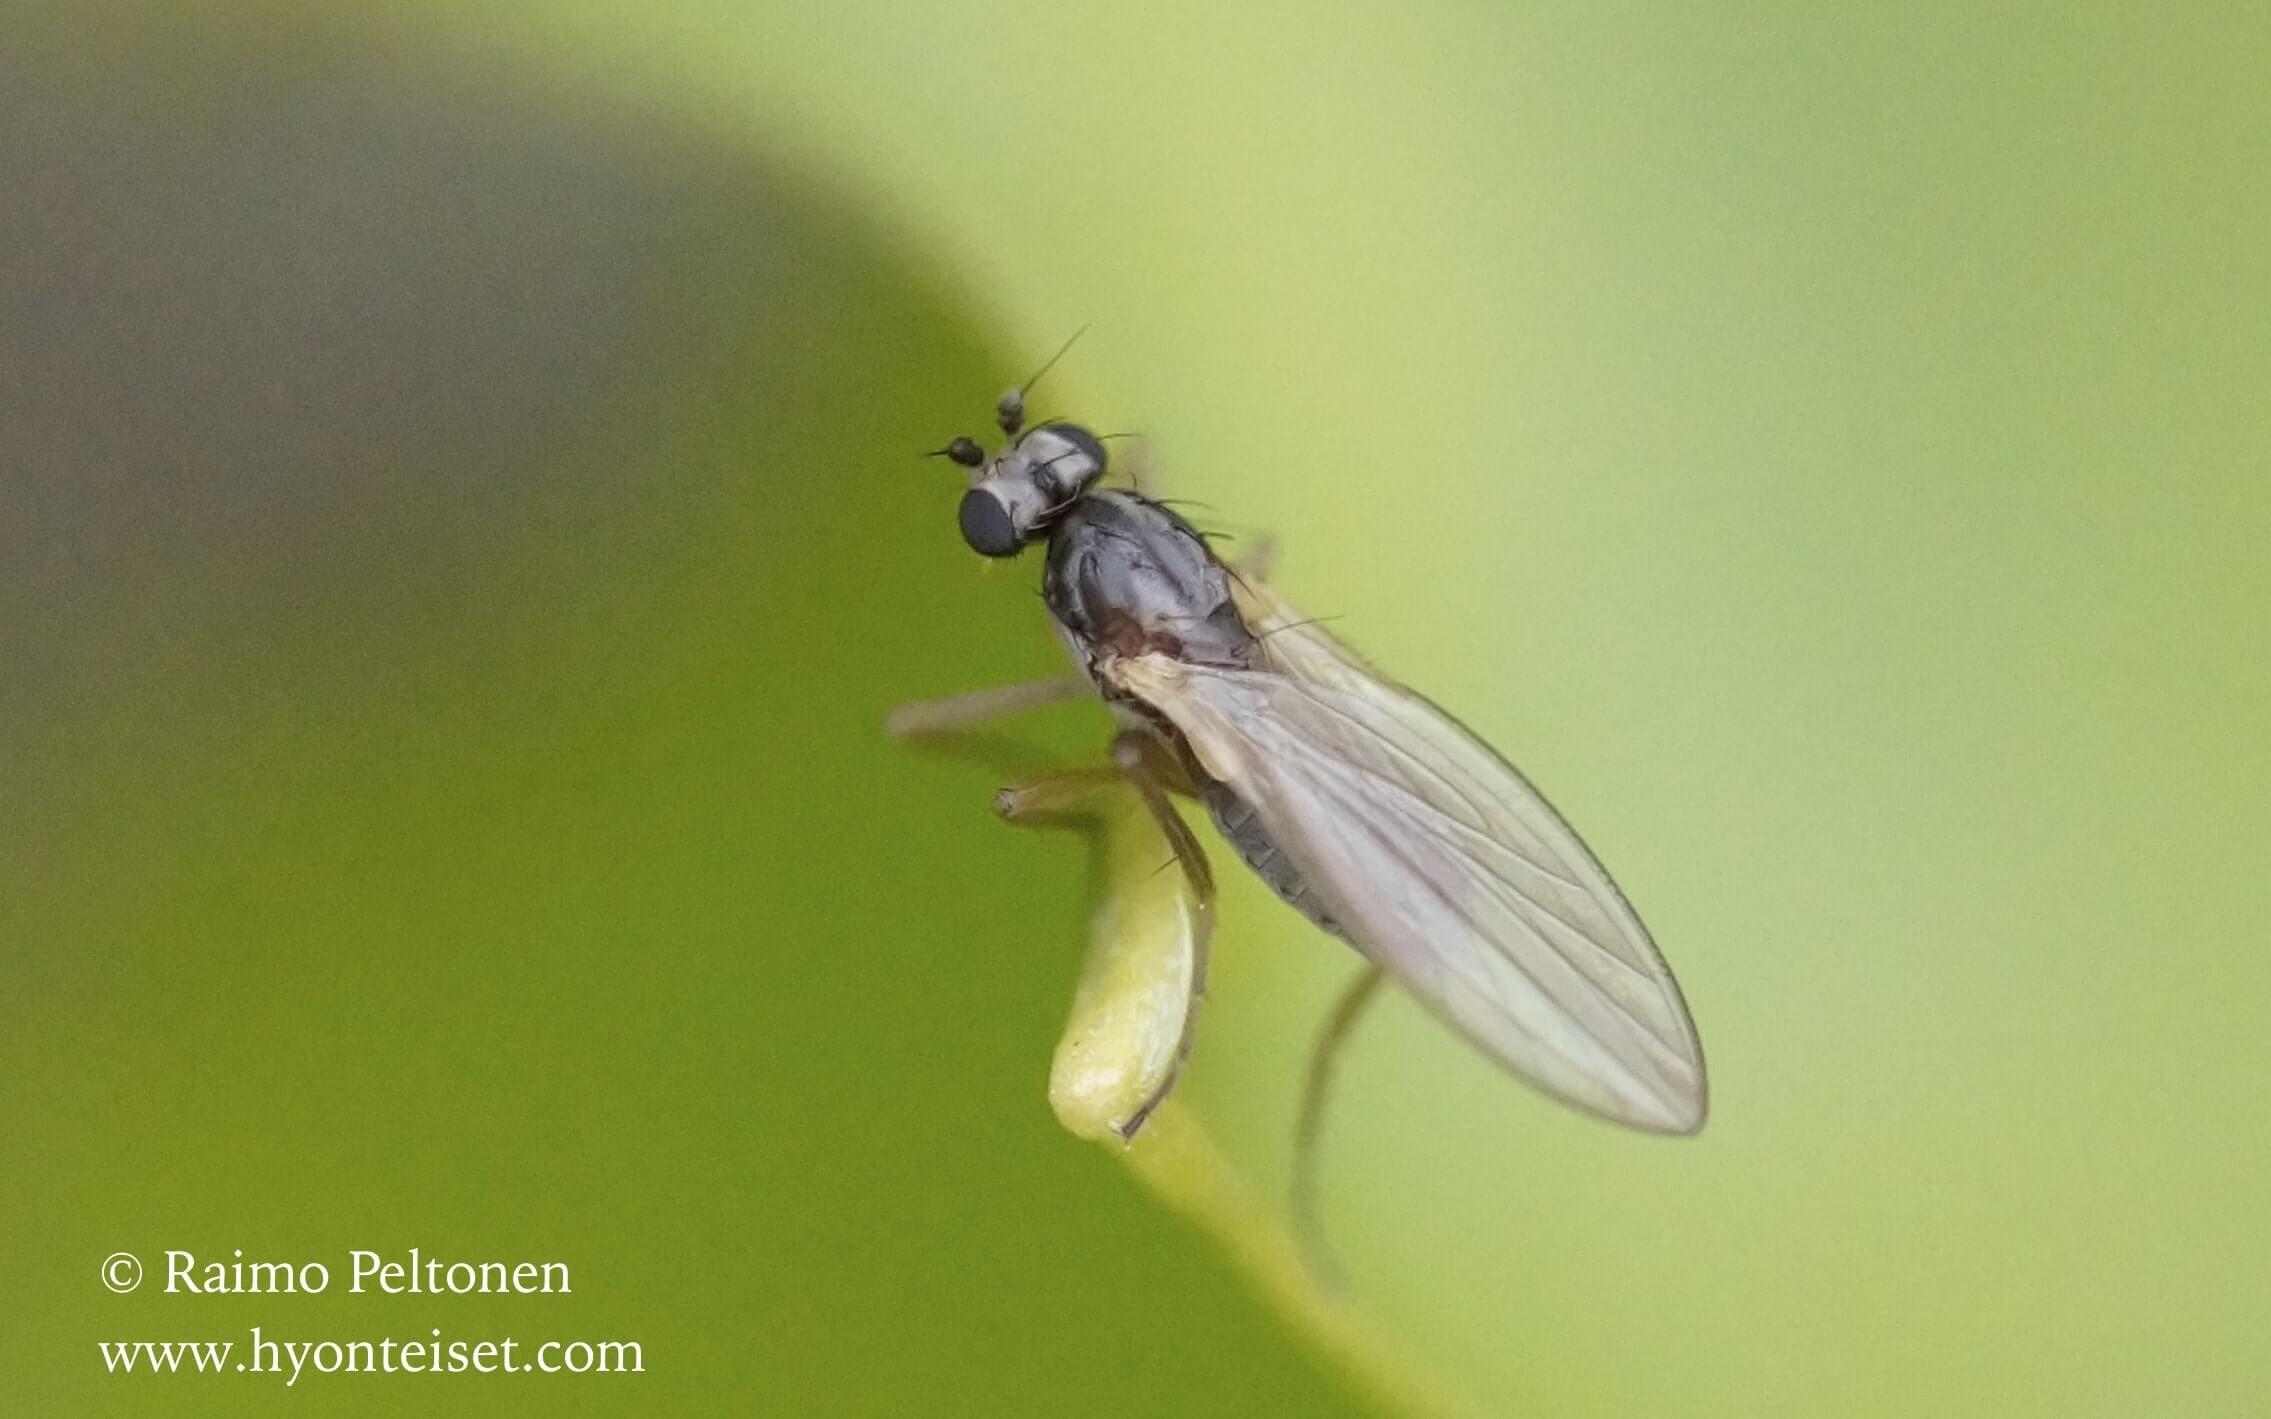 Longchoptera bifurcata (det. Kaj Winqvist)